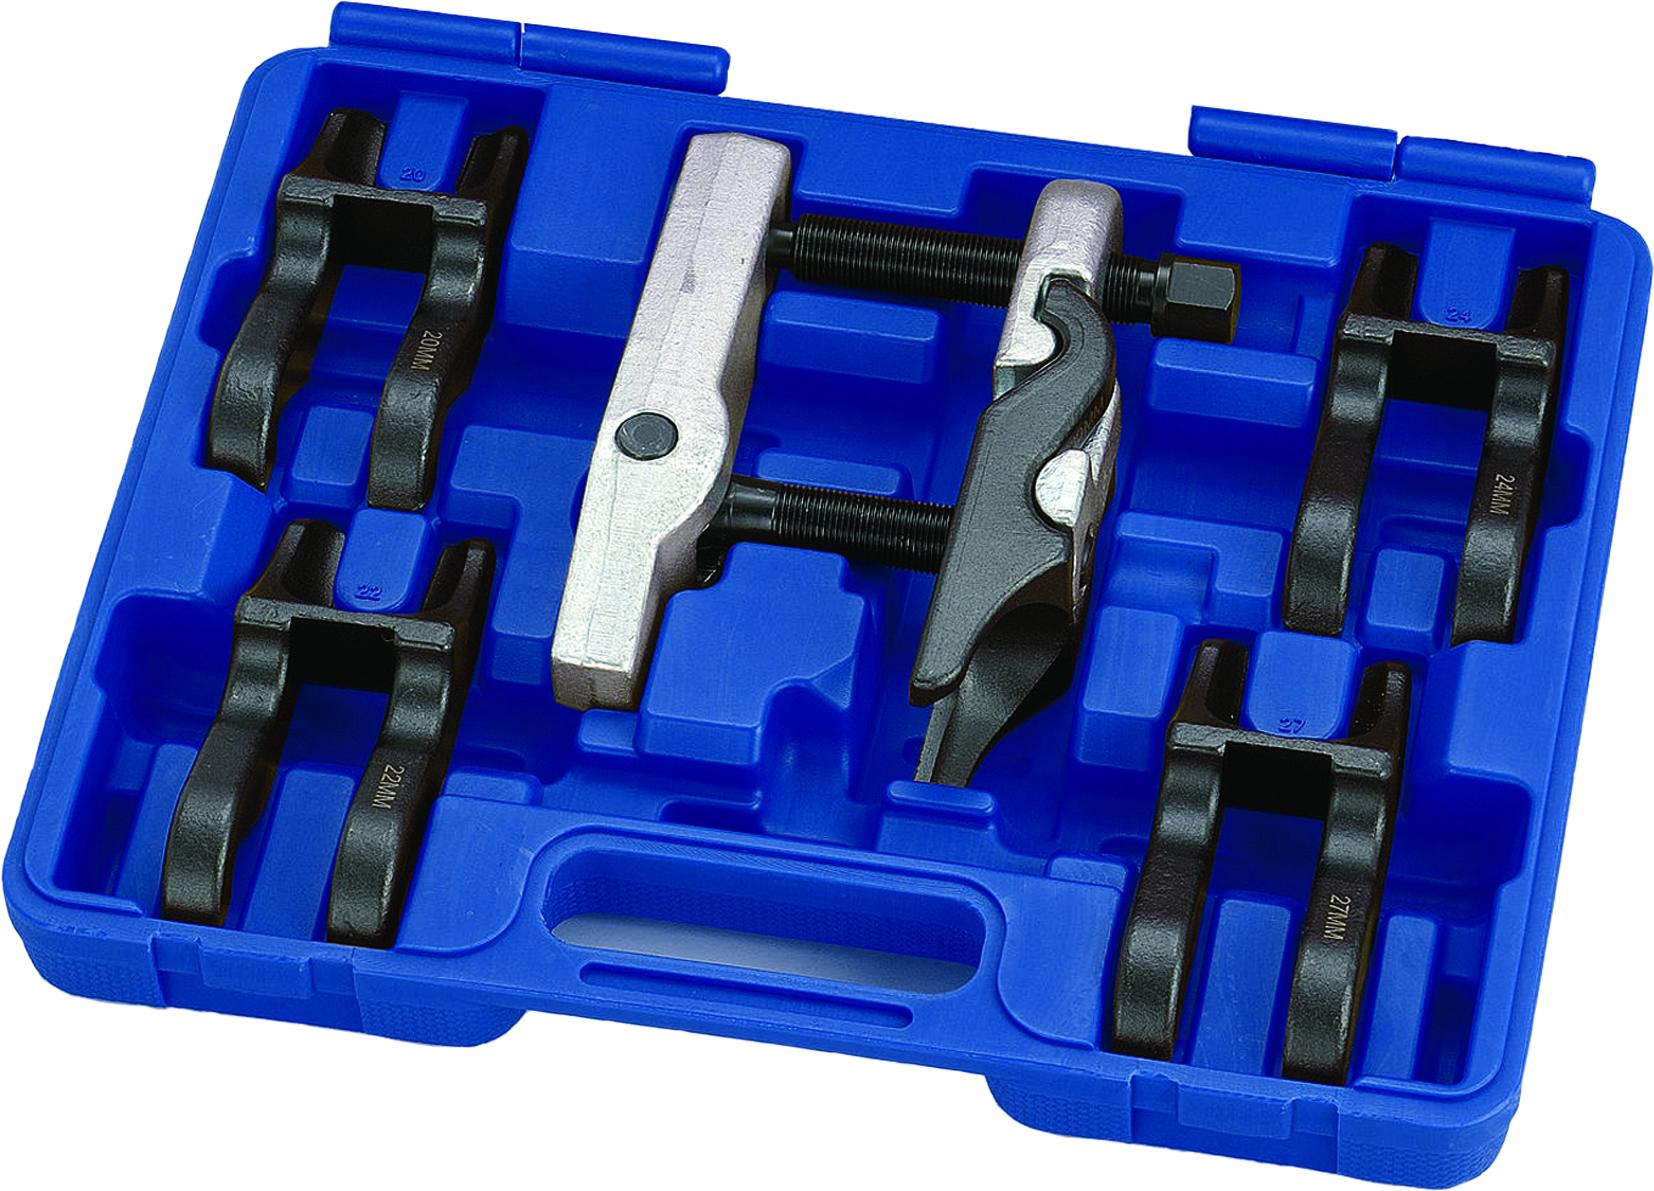 Ball pin-Ausdrückersatz 6-piece Adjustable + change jaws 20-22-24-27-30mm